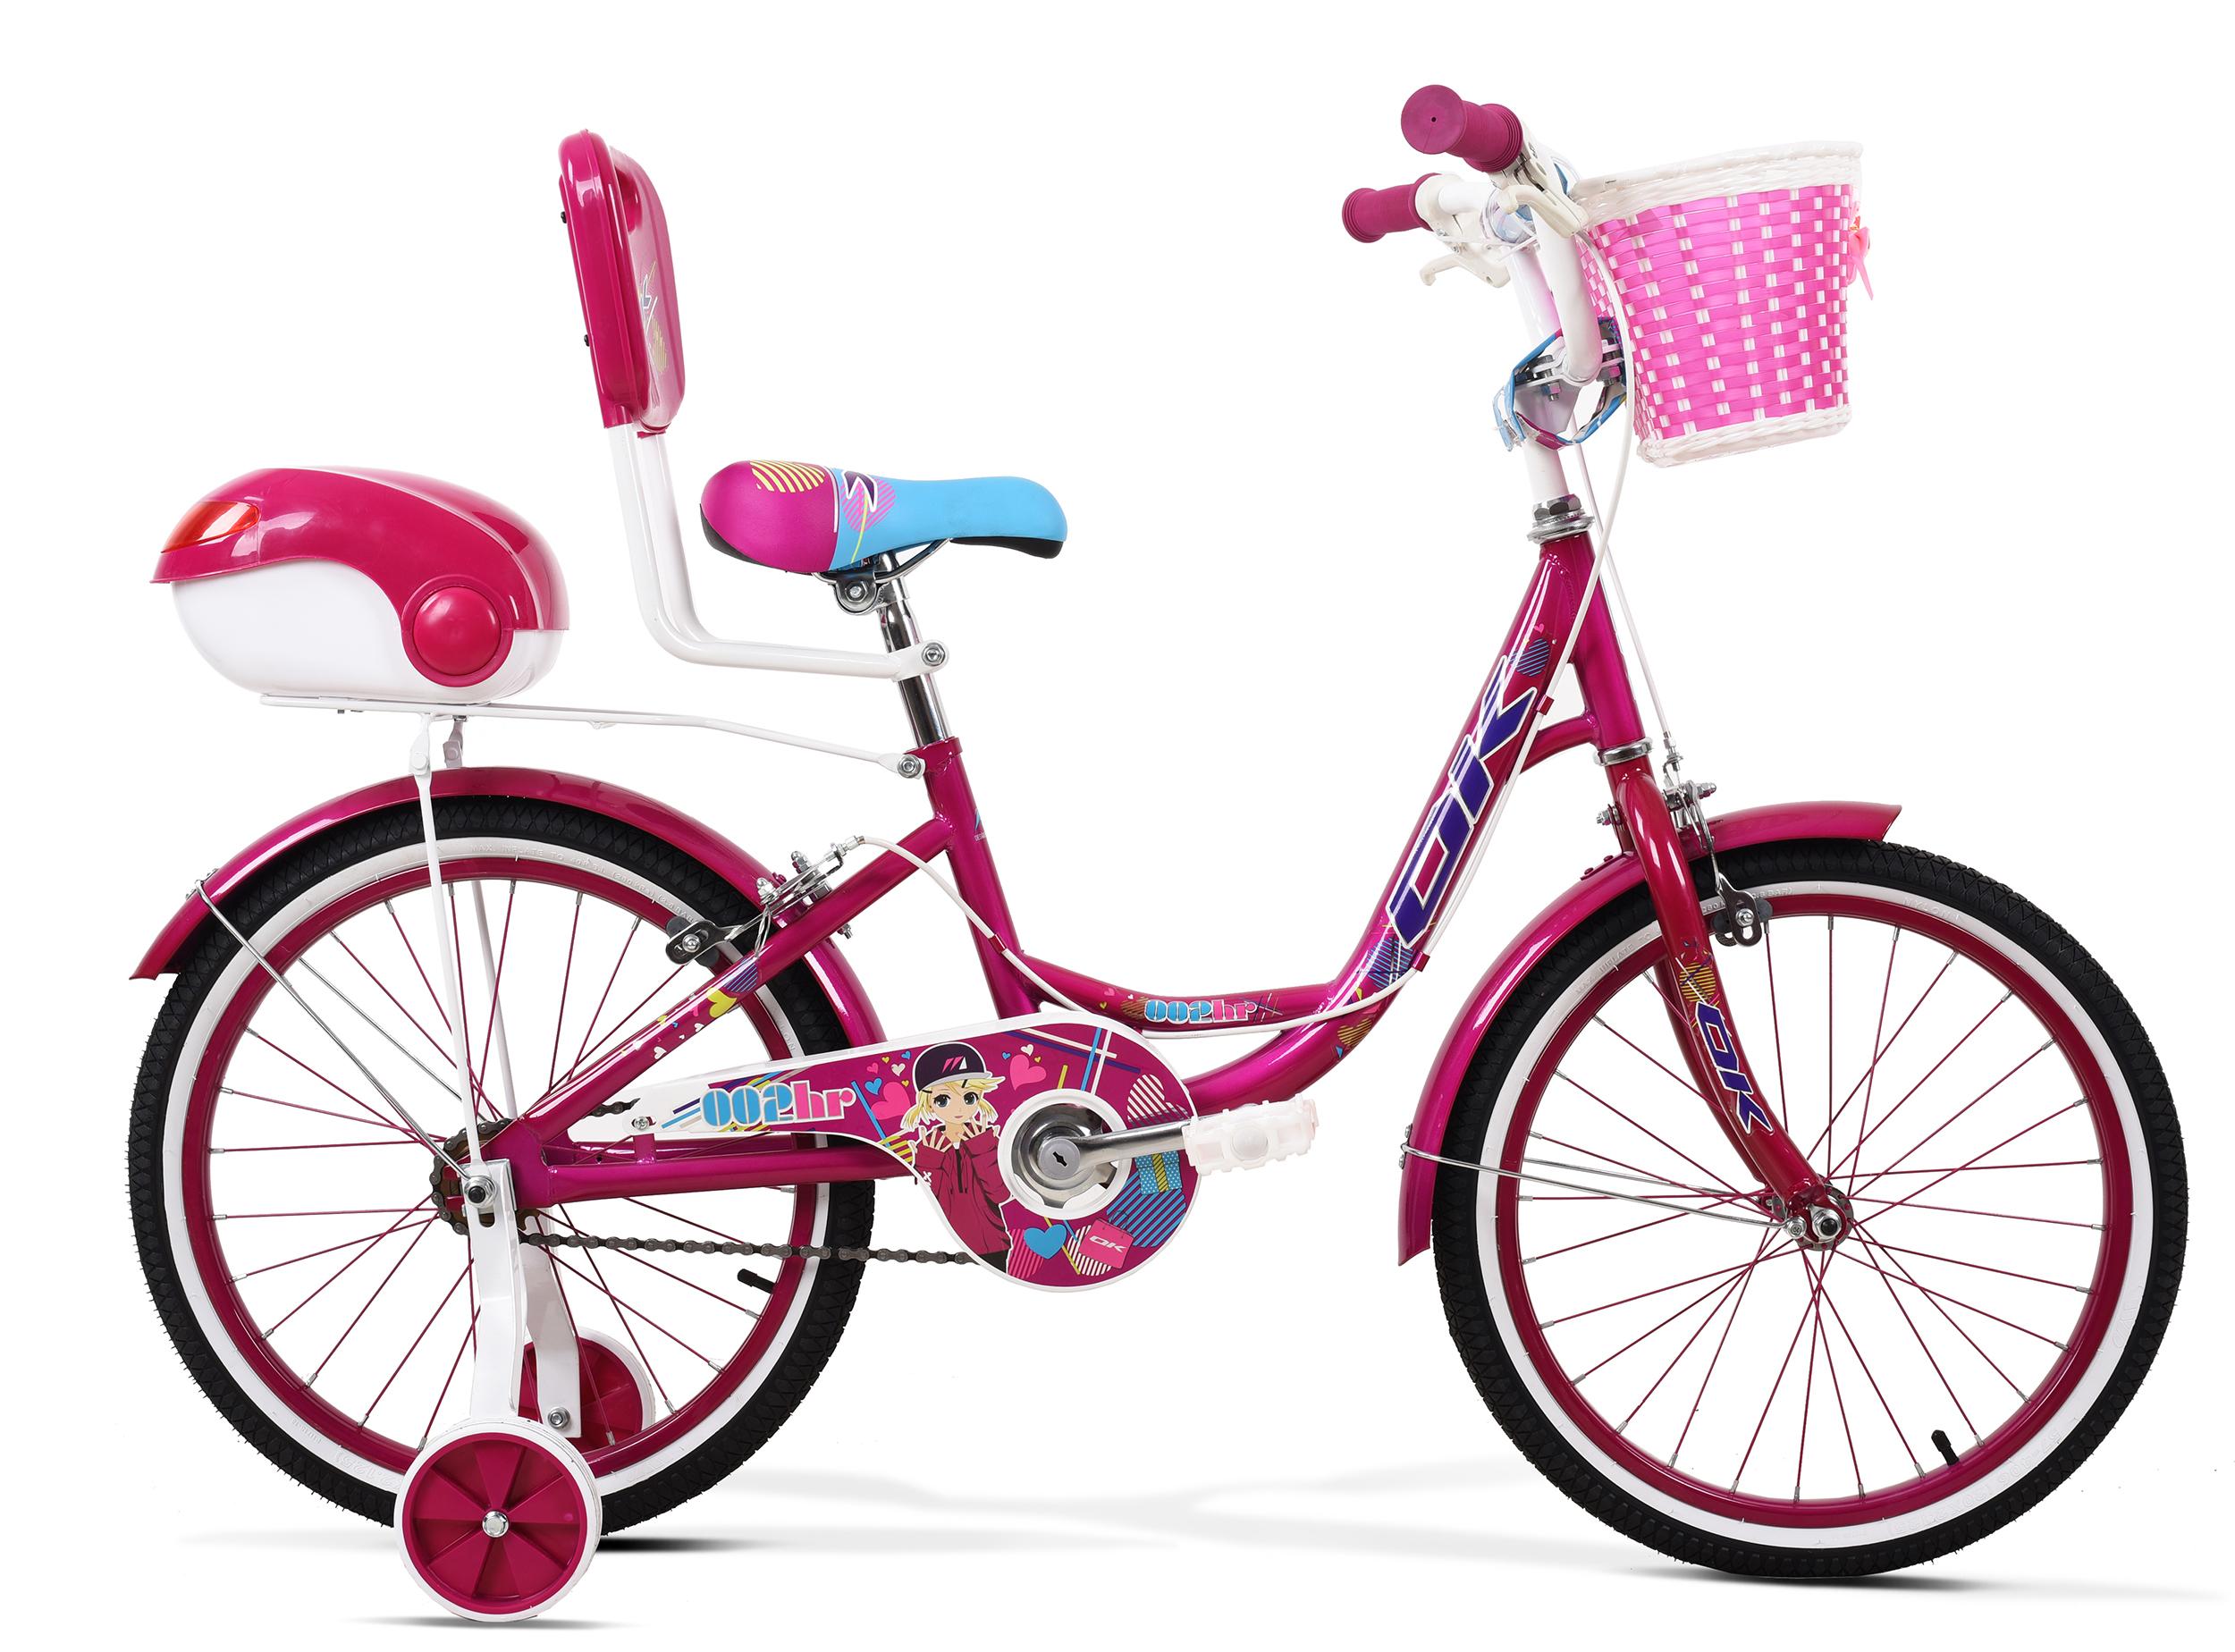 دوچرخه سایز 20 مدل K20002HR